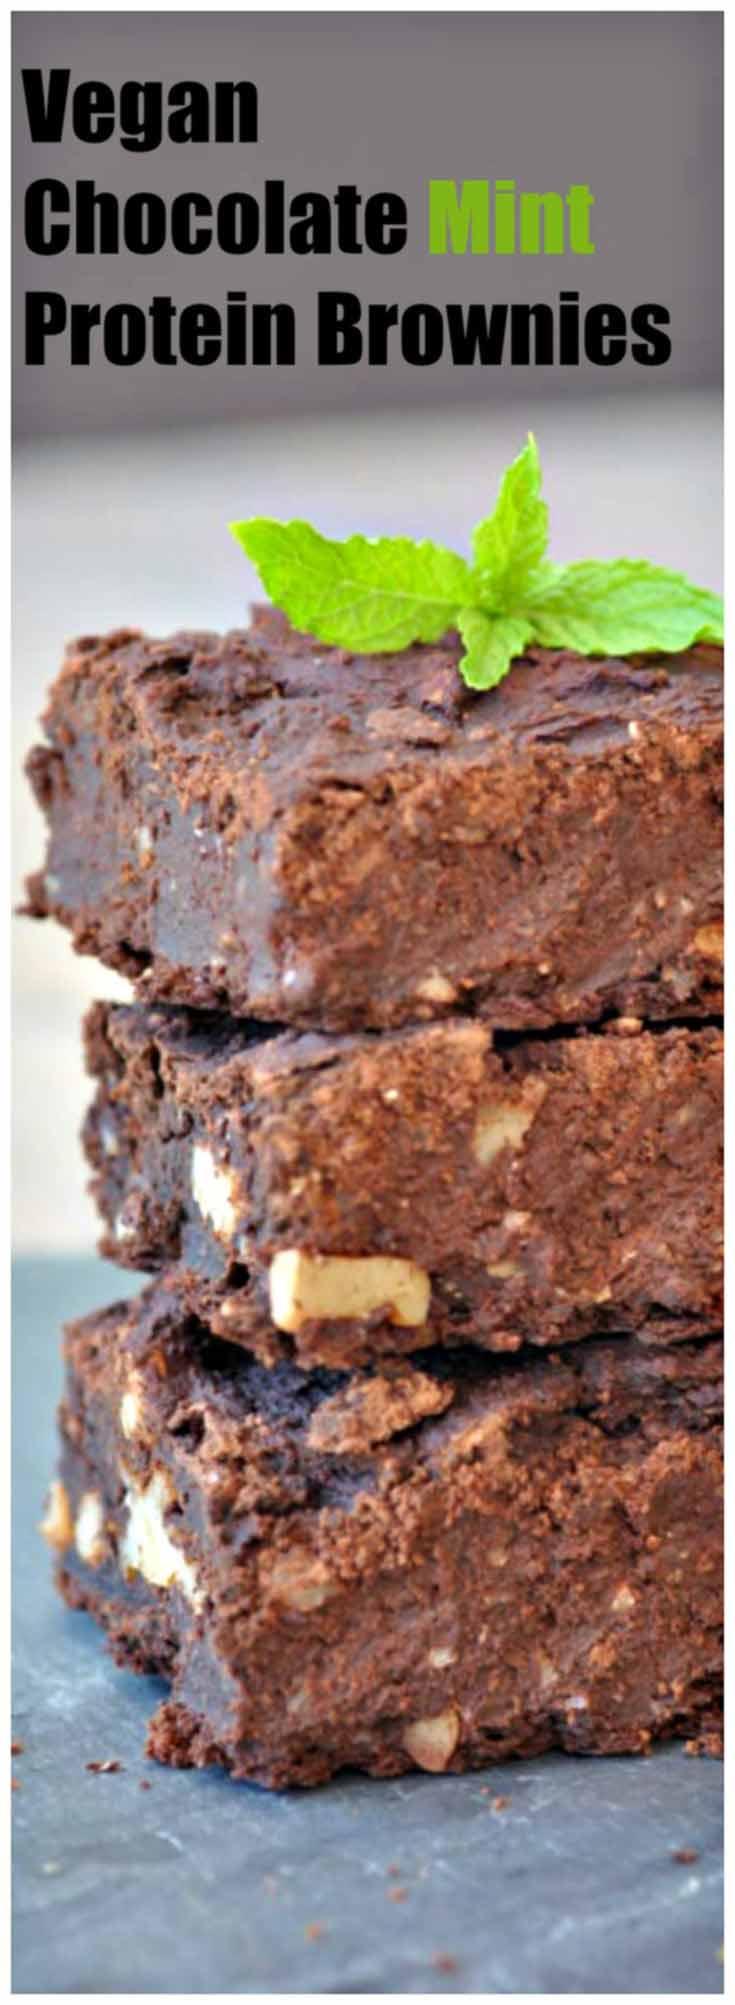 Easy Homemade Vegan Chocolate + Instant Hot Chocolate ...